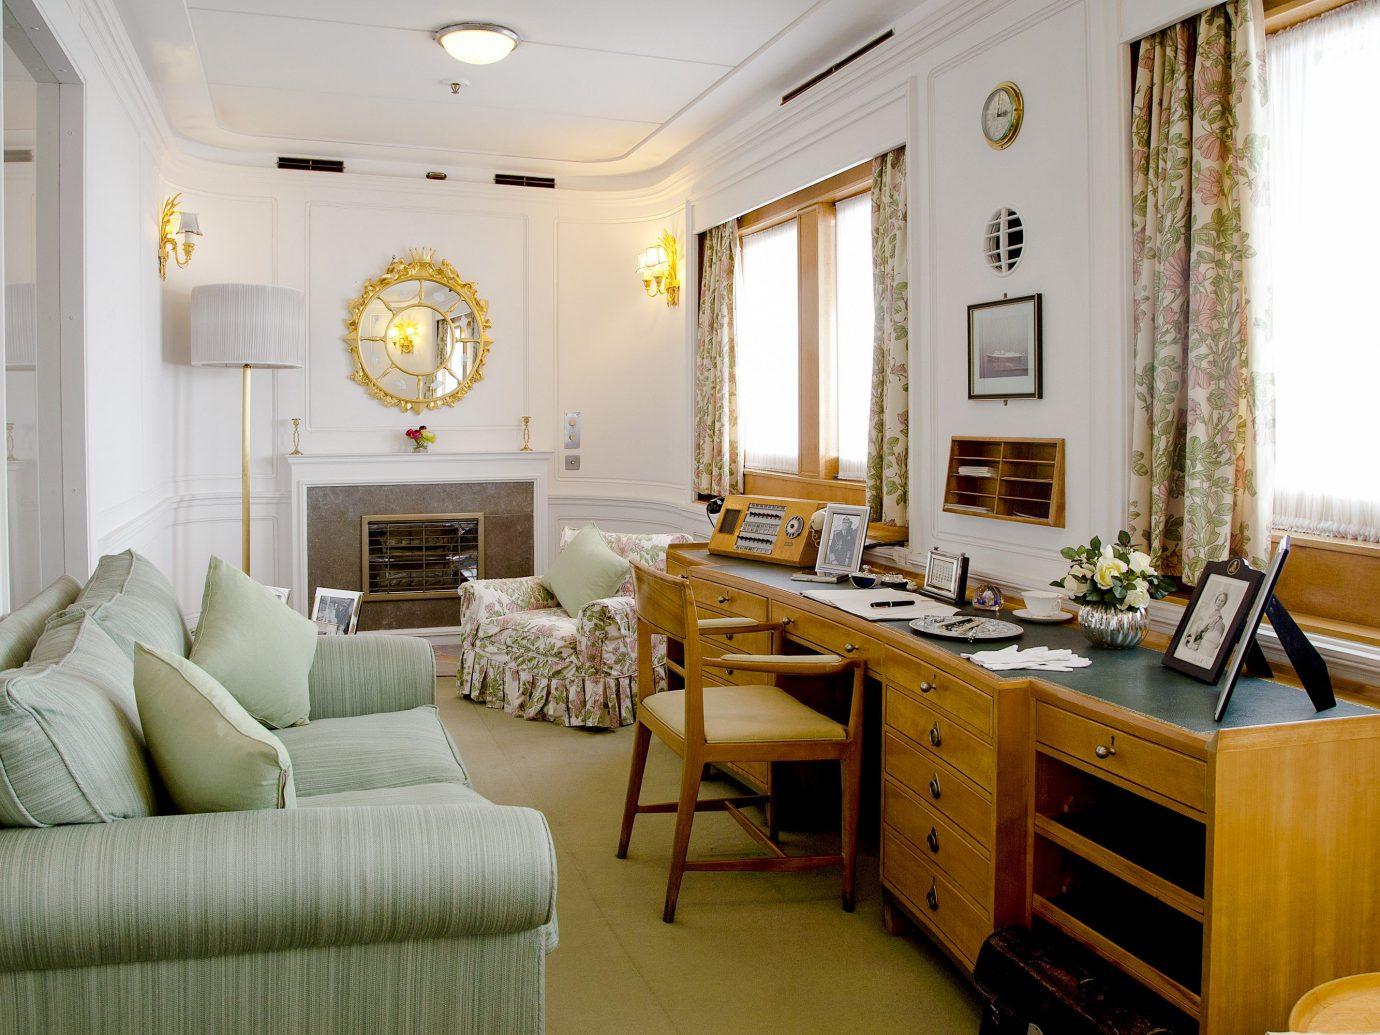 Edinburgh Hotels Jetsetter Guides Scotland Travel Tips Trip Ideas indoor floor room Living ceiling living room window interior design real estate home furniture